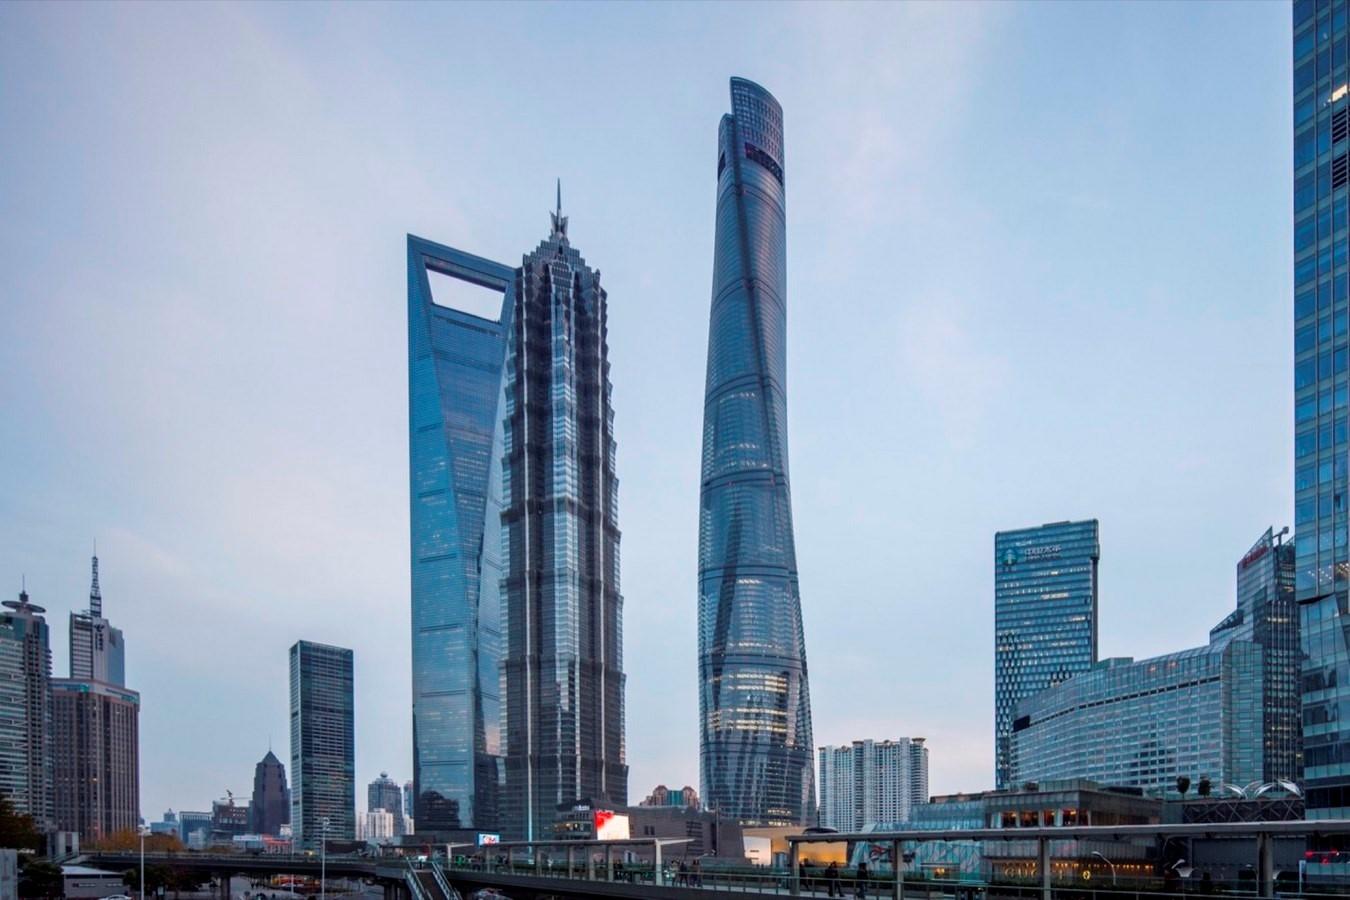 Shanghai Tower, China - Sheet2